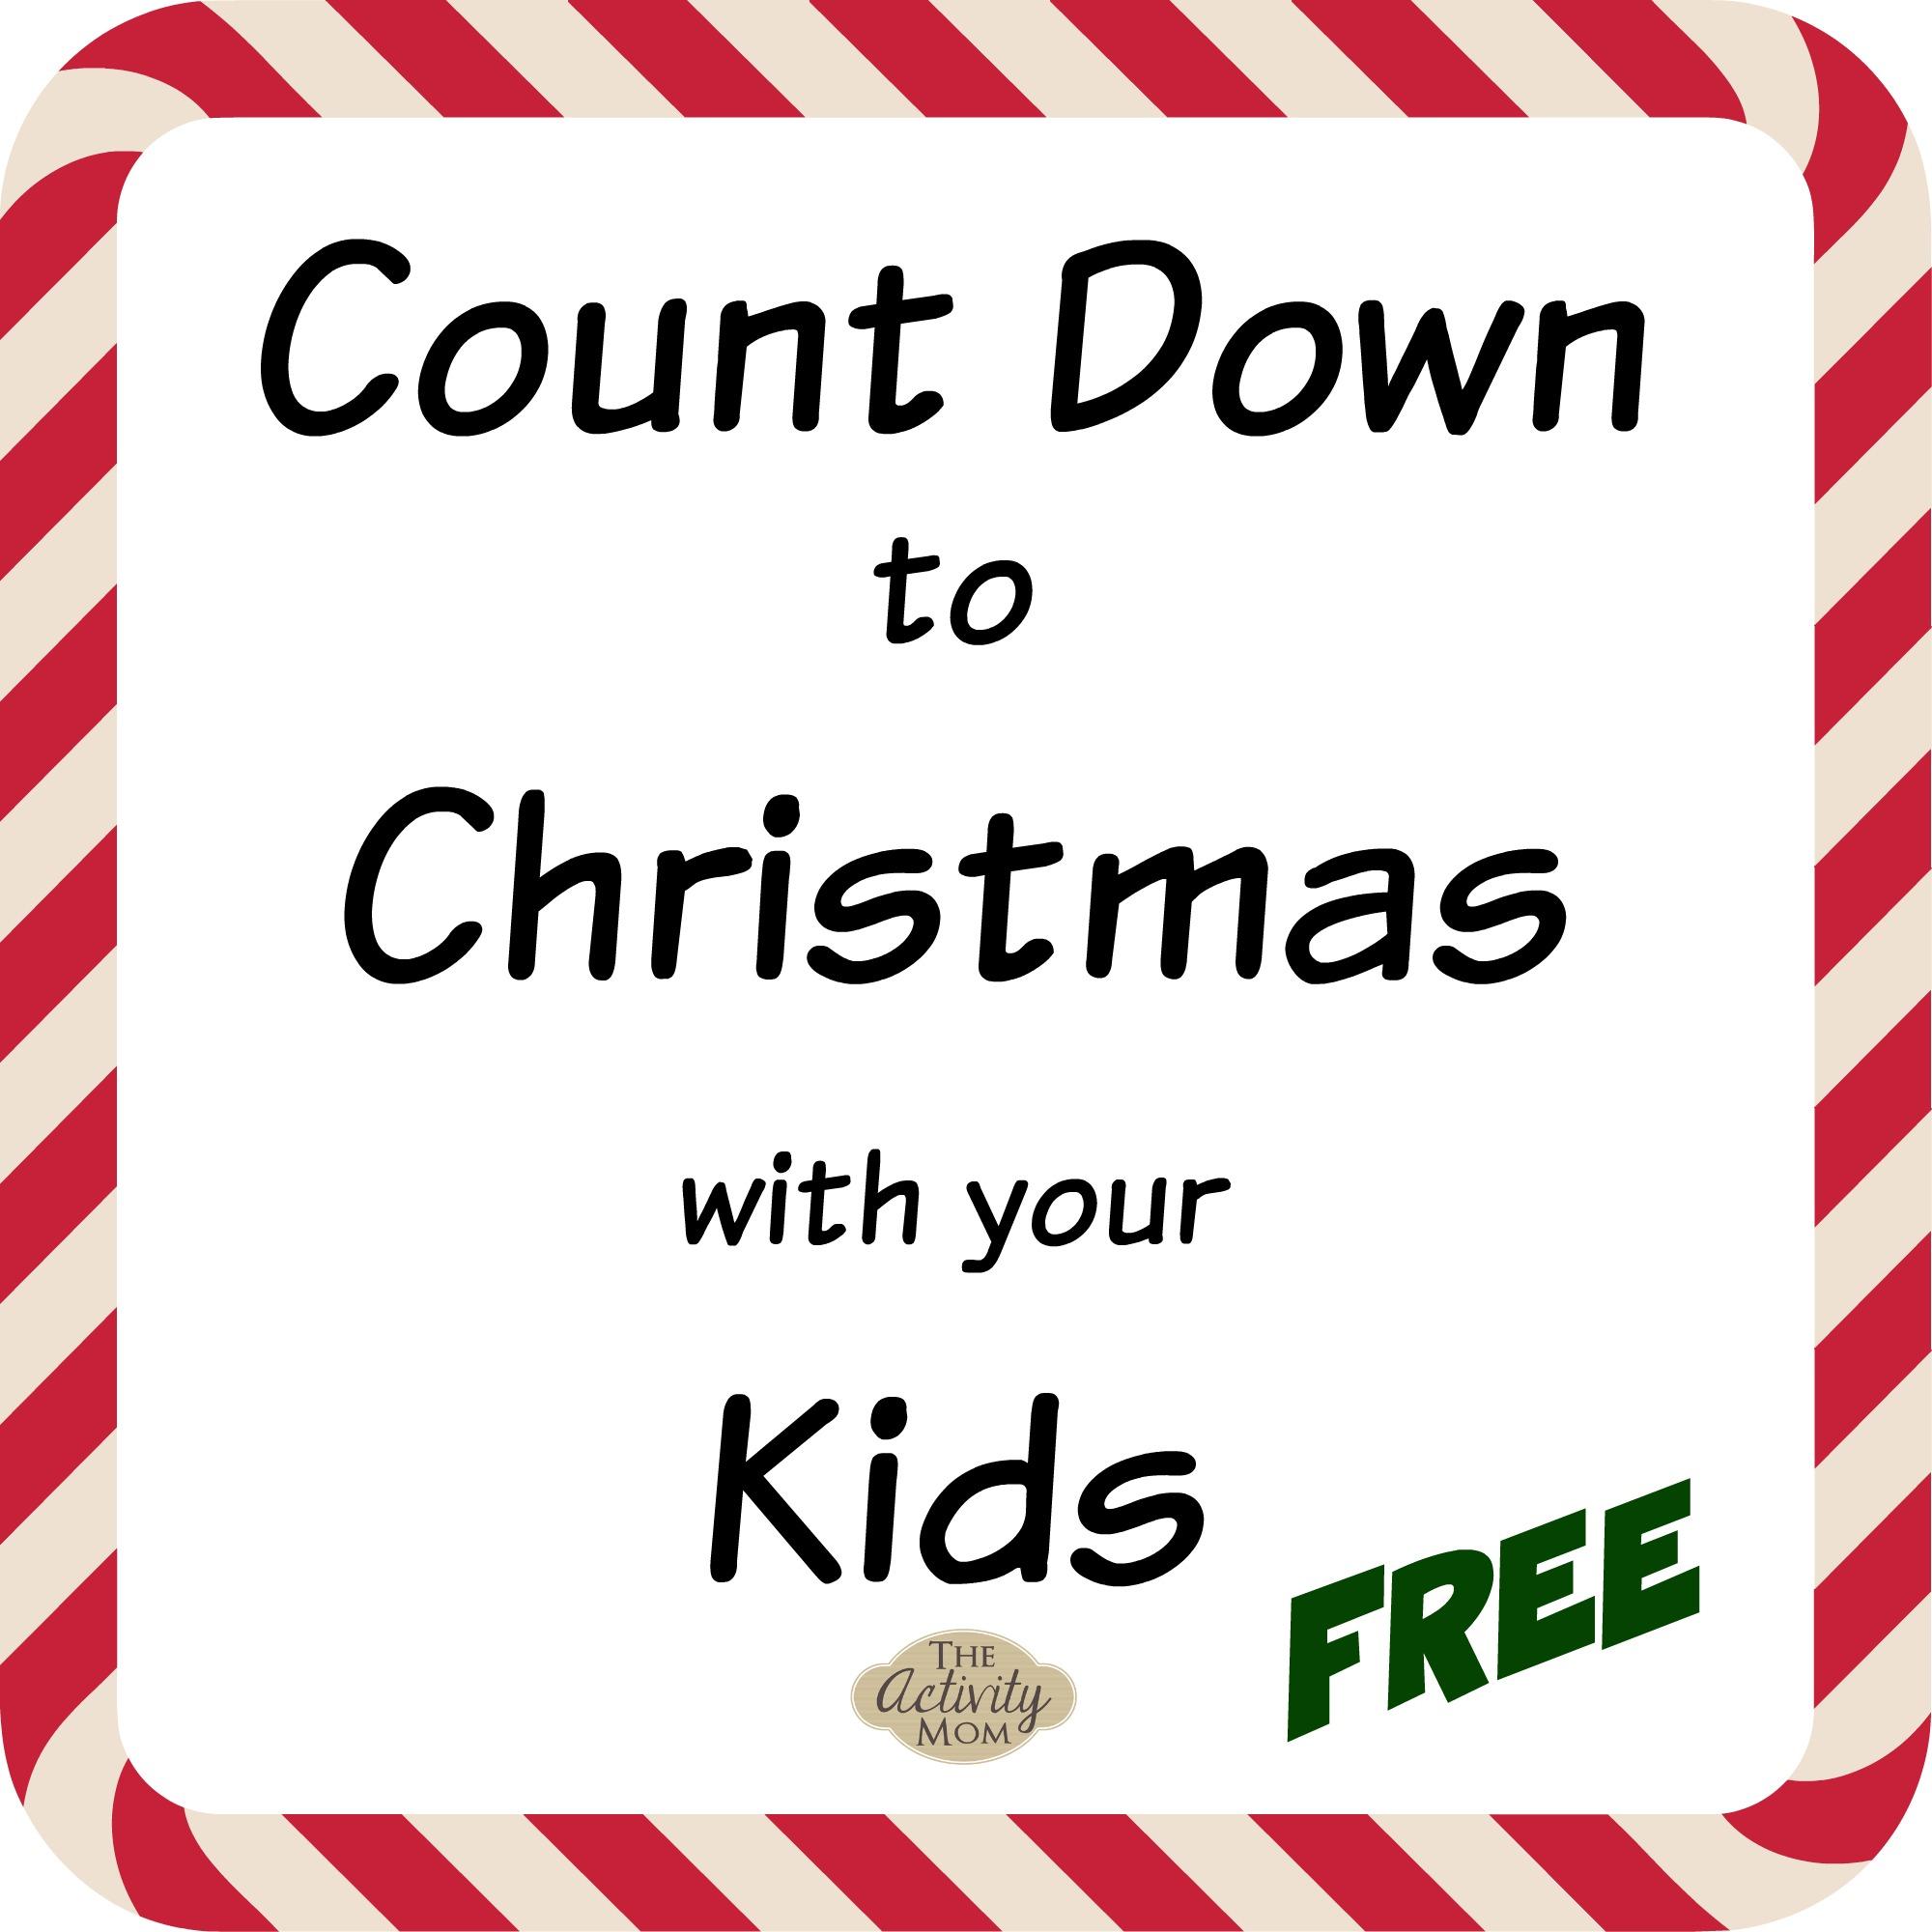 Christmas Countdown Ideas.The Activity Mom Christmas Countdown Ideas The Activity Mom